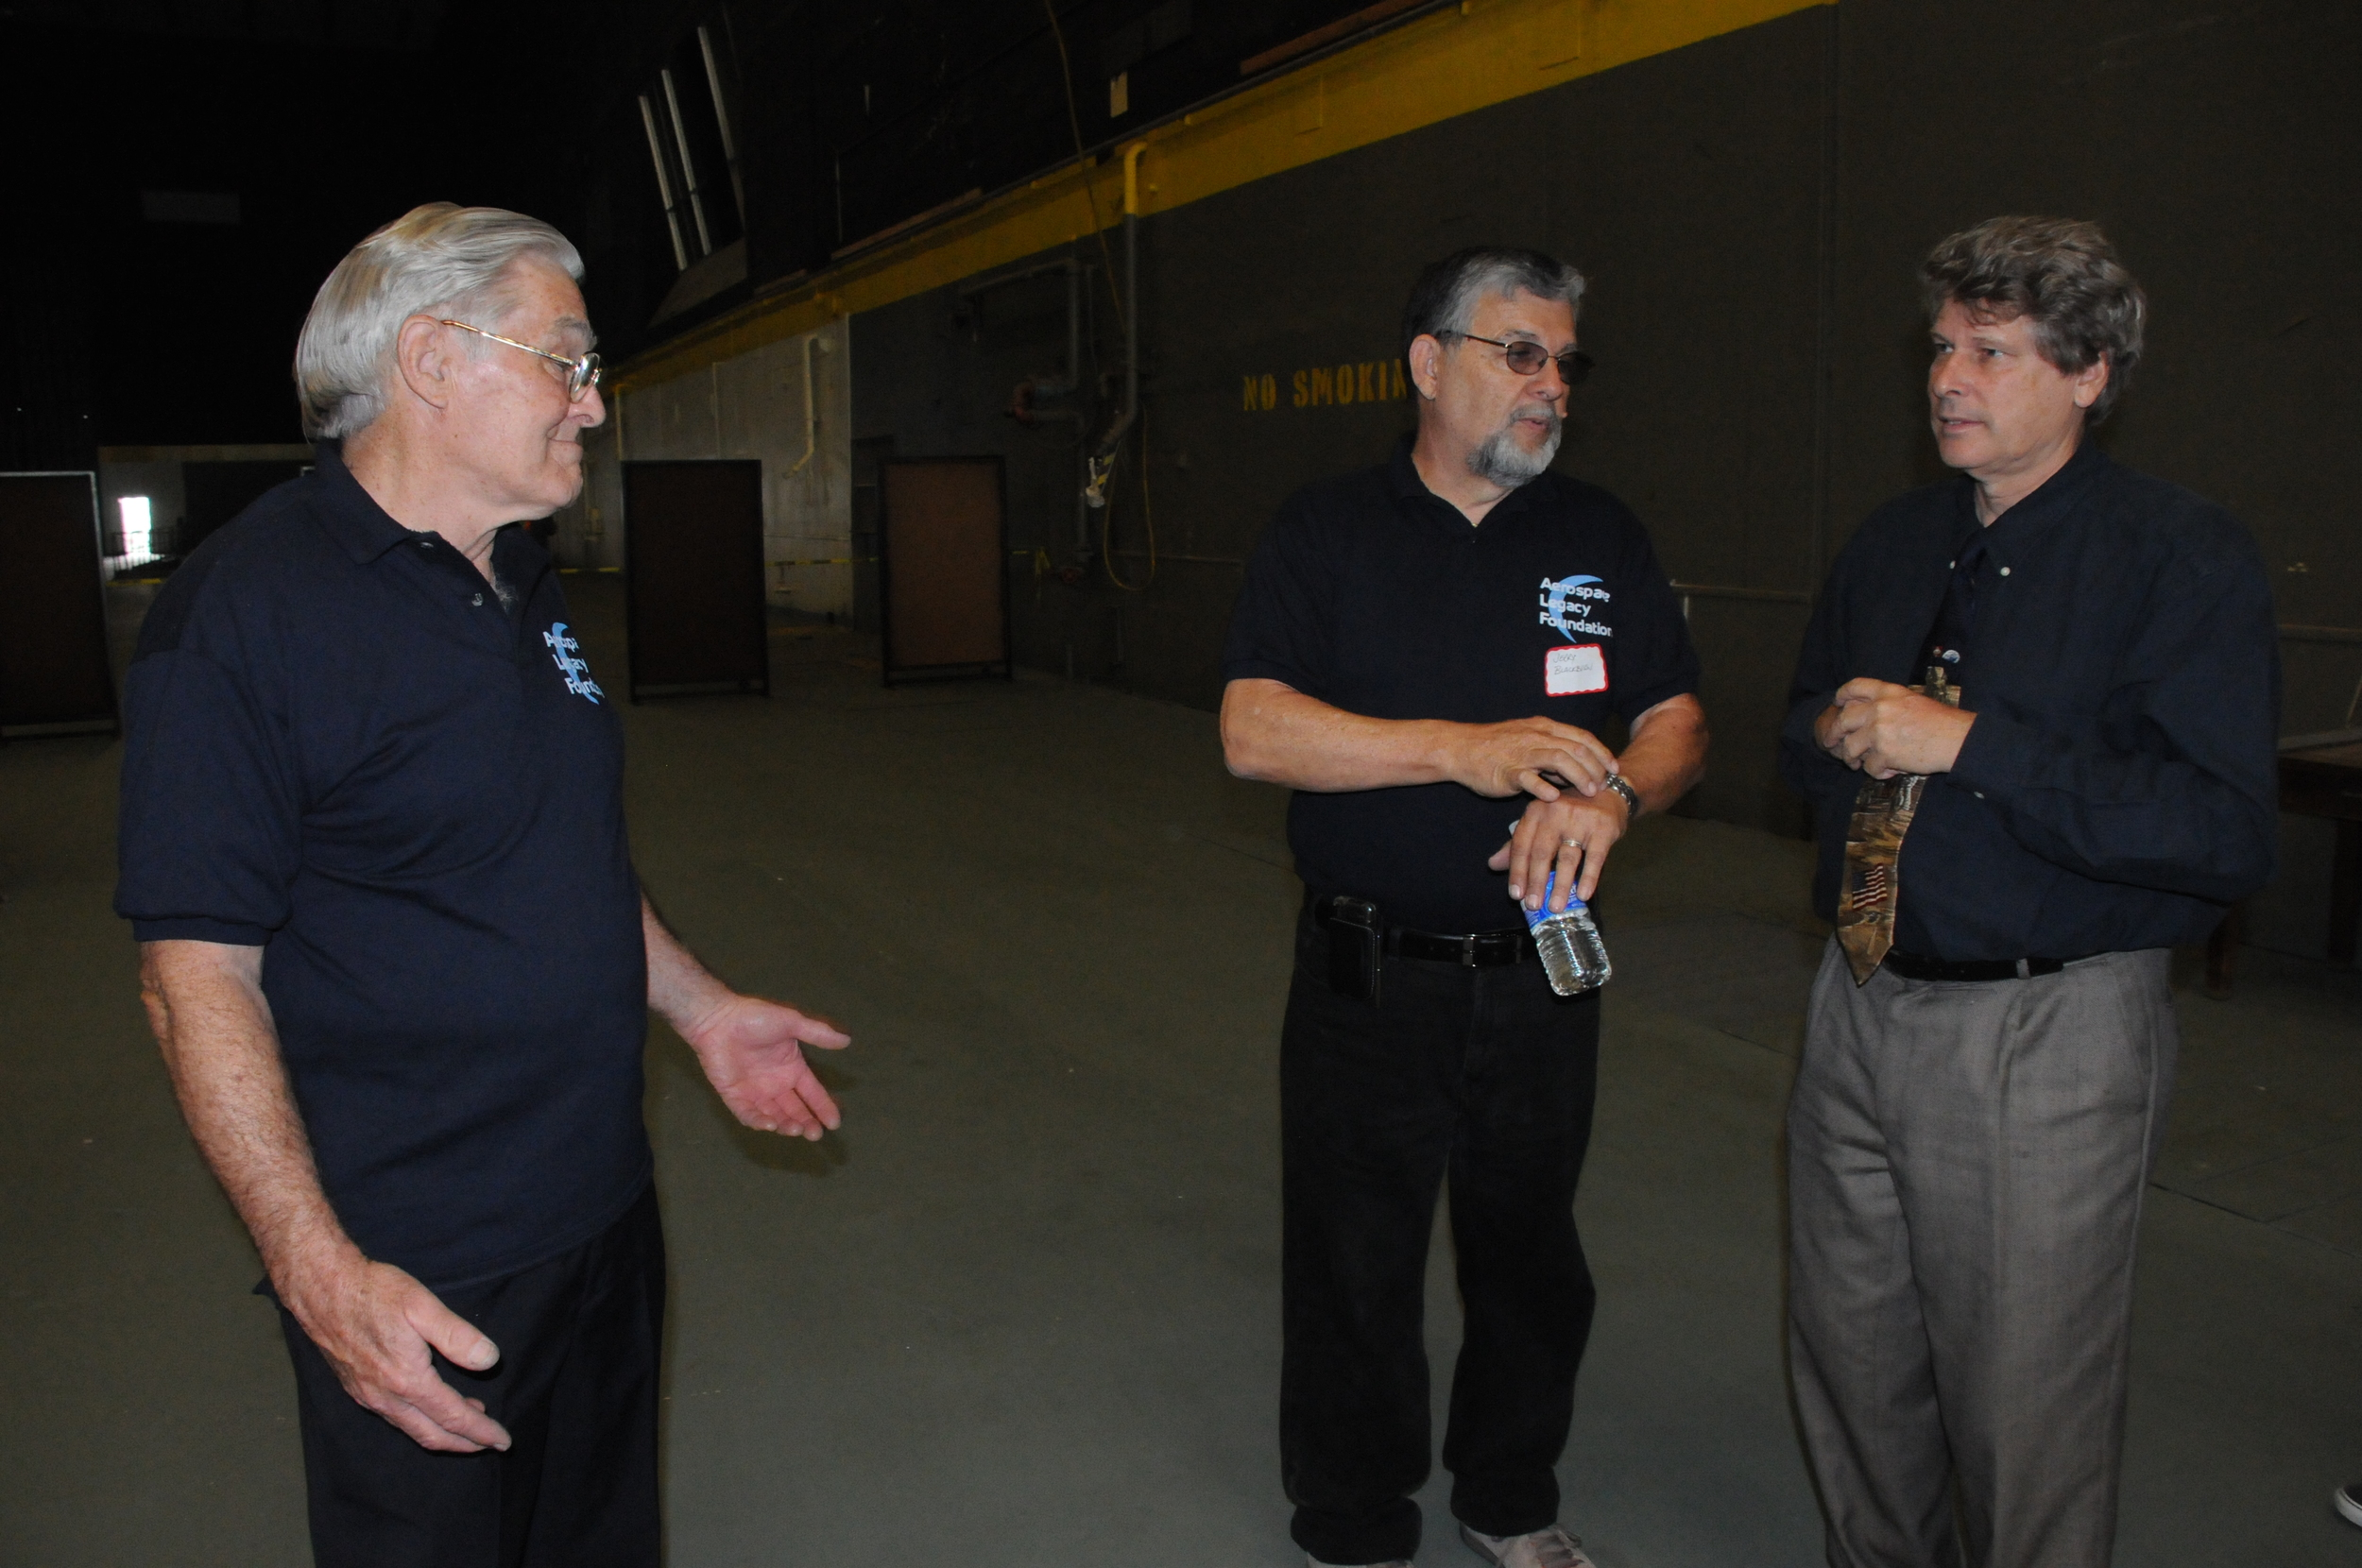 Bob Sechrist and Jerry Blackburn left